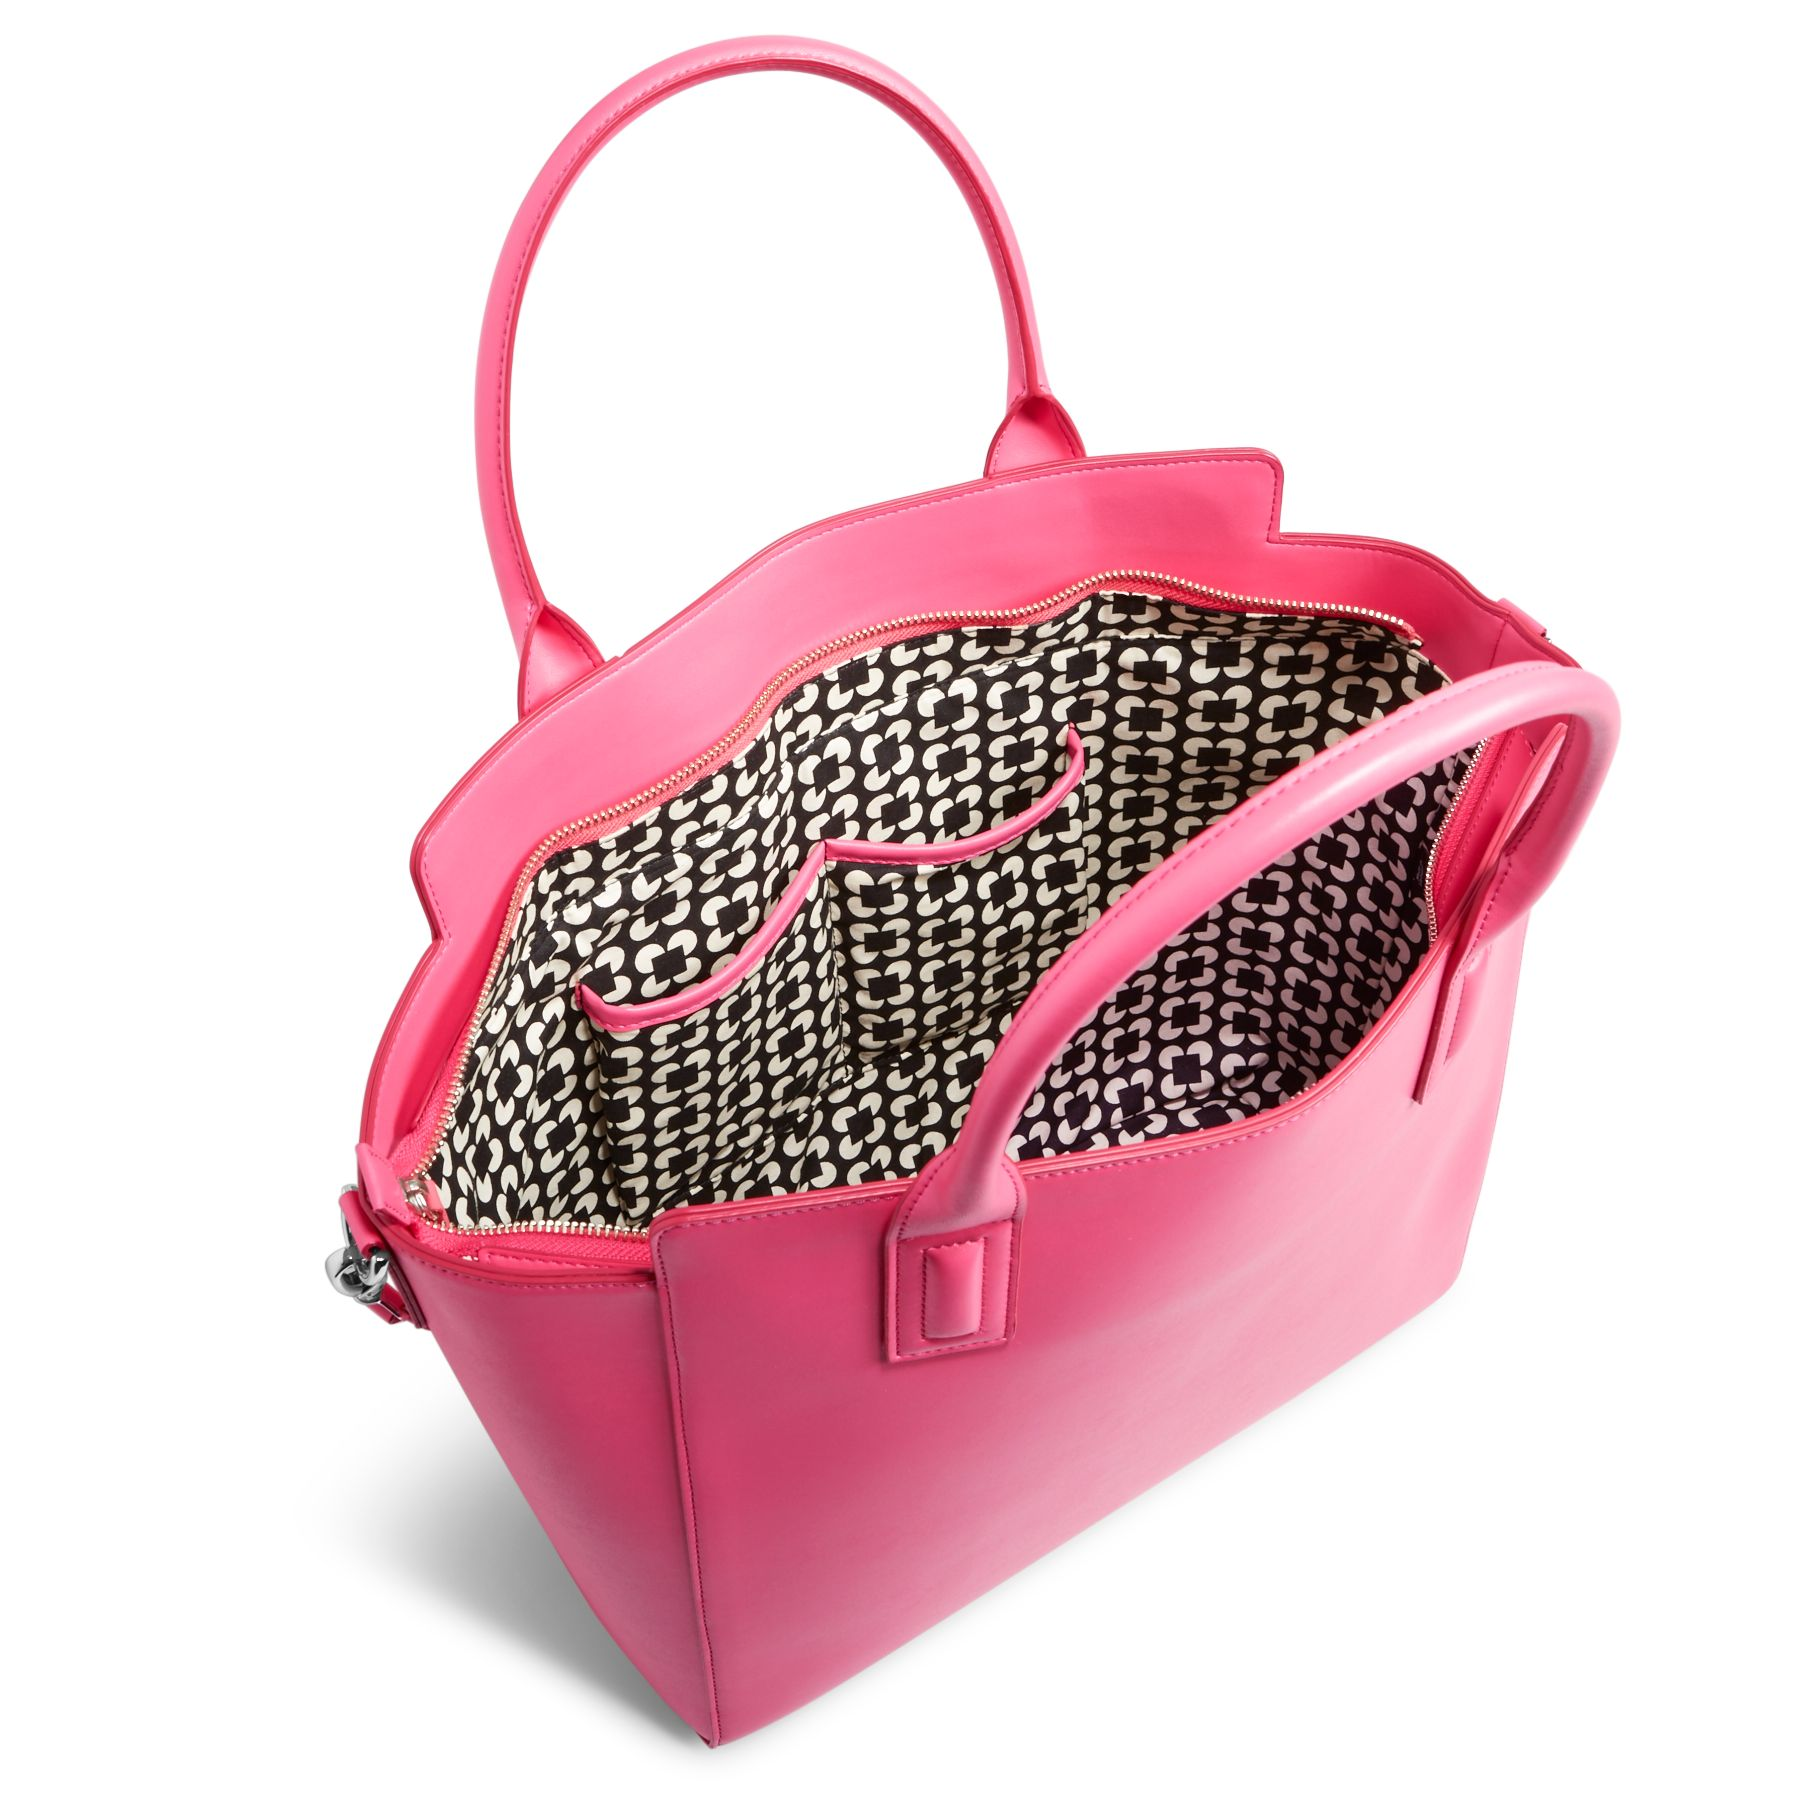 Vera Bradley Faux Leather Tote Bag